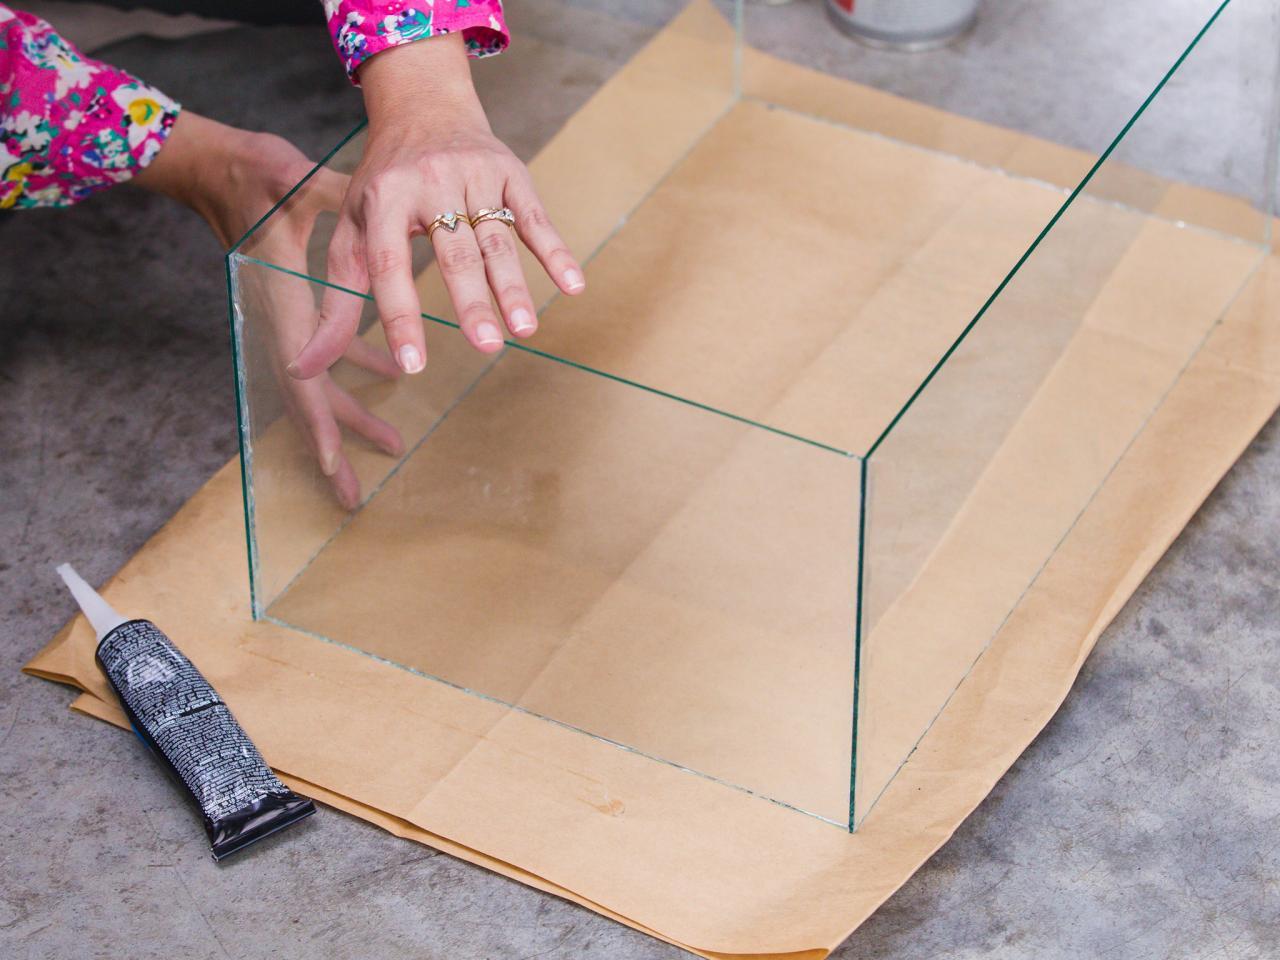 DIY Tabletop Fire Pit: Finish Glass Box